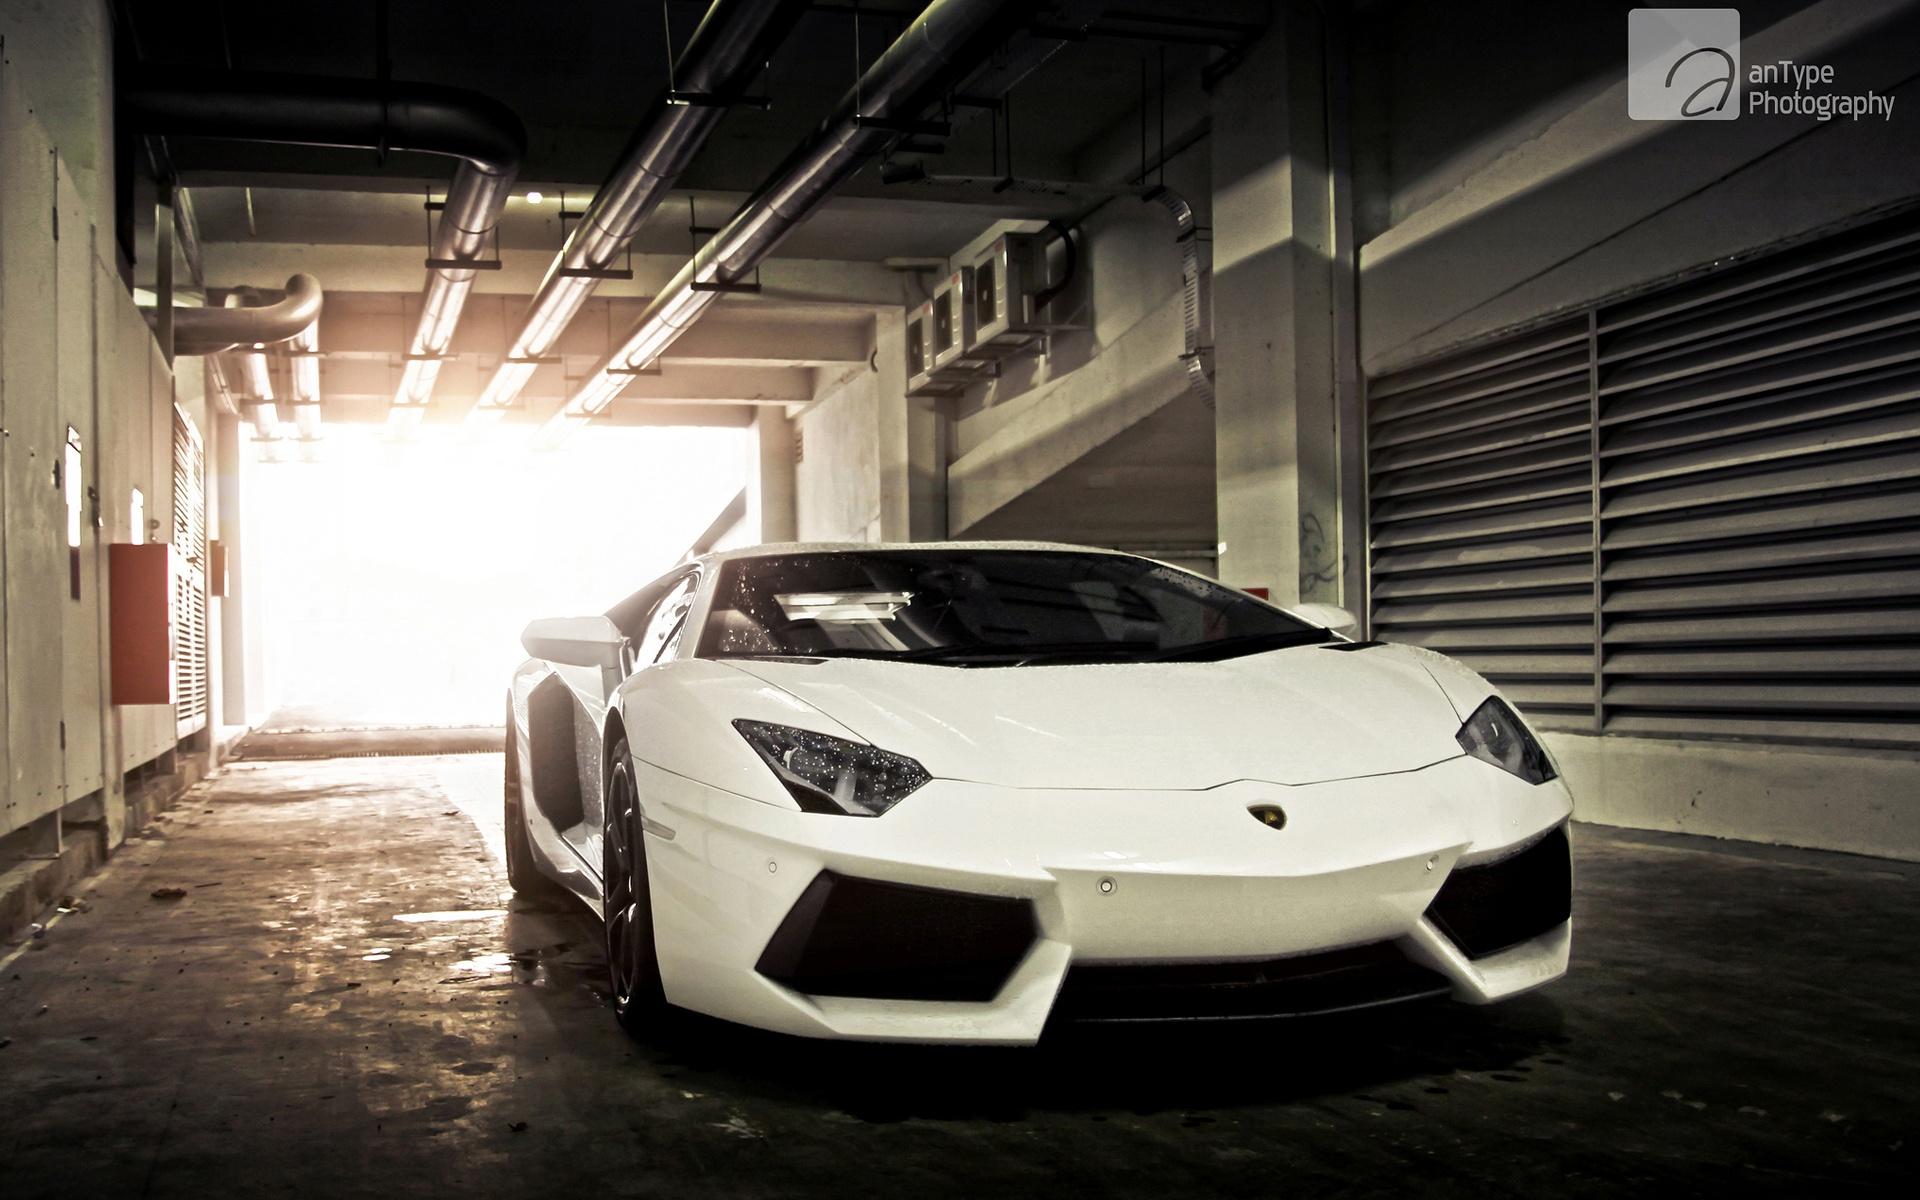 Lamborghini Aventador Latest Wallpapers